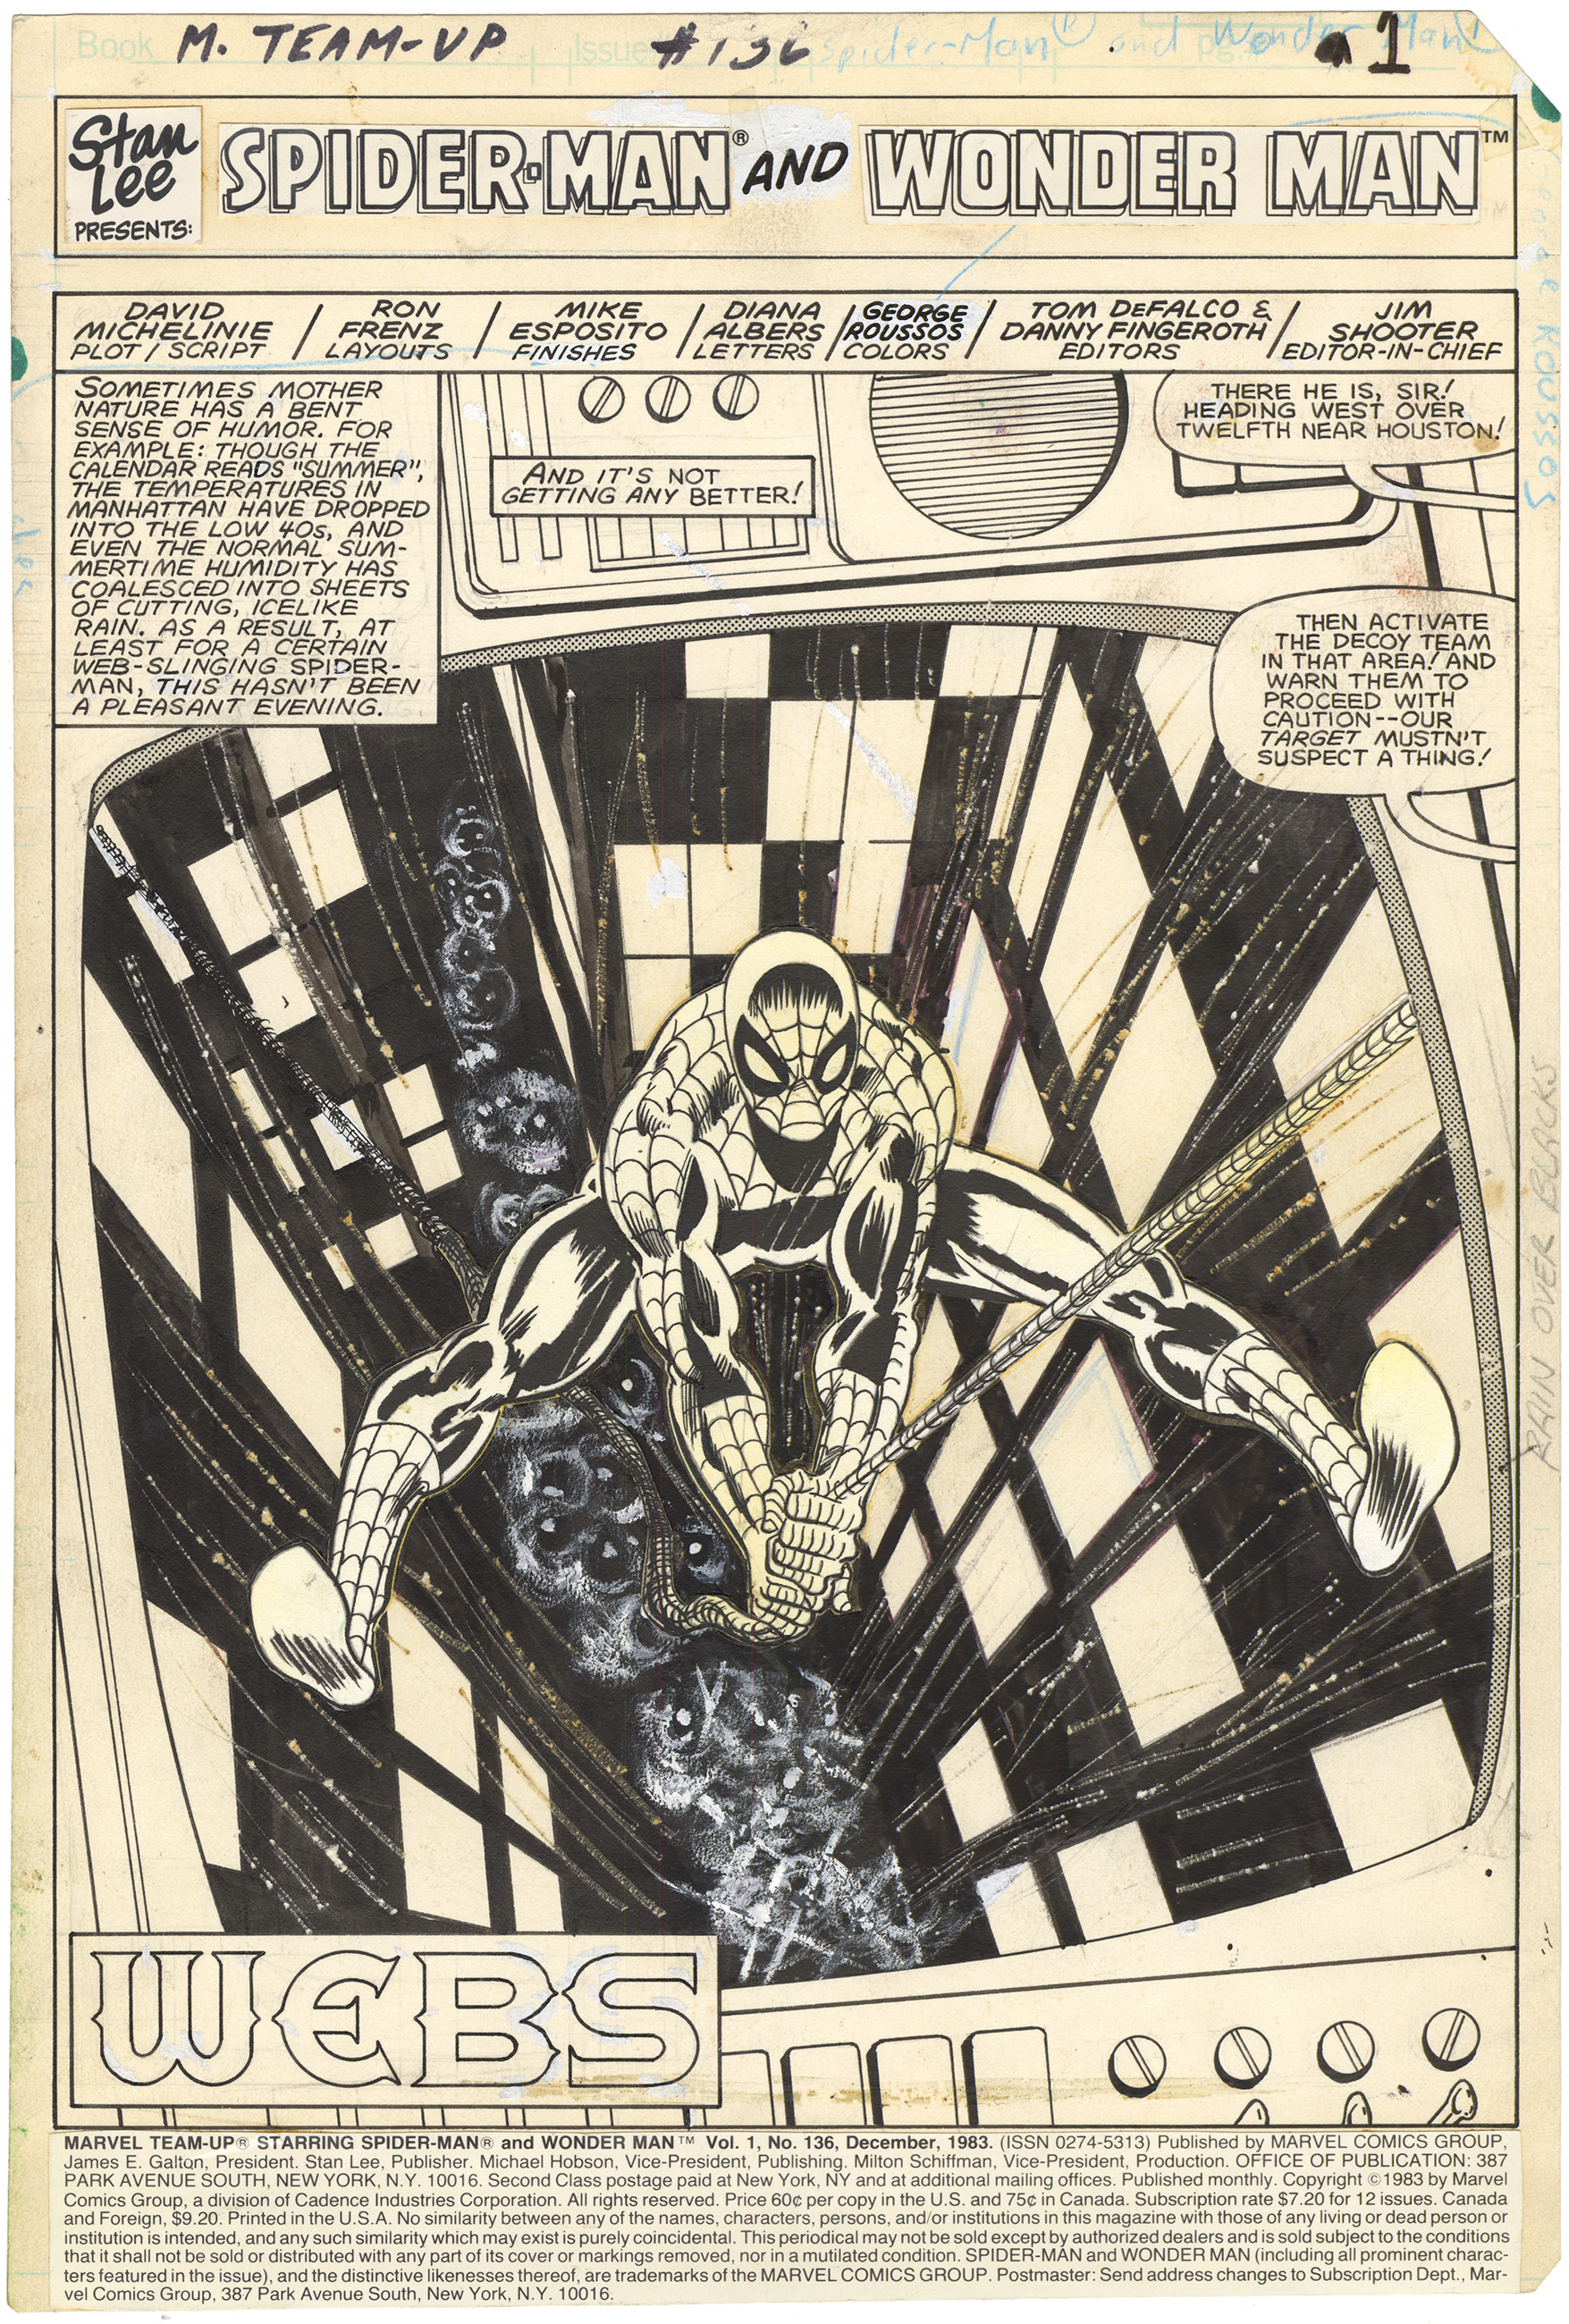 Marvel Team-Up #136 p1